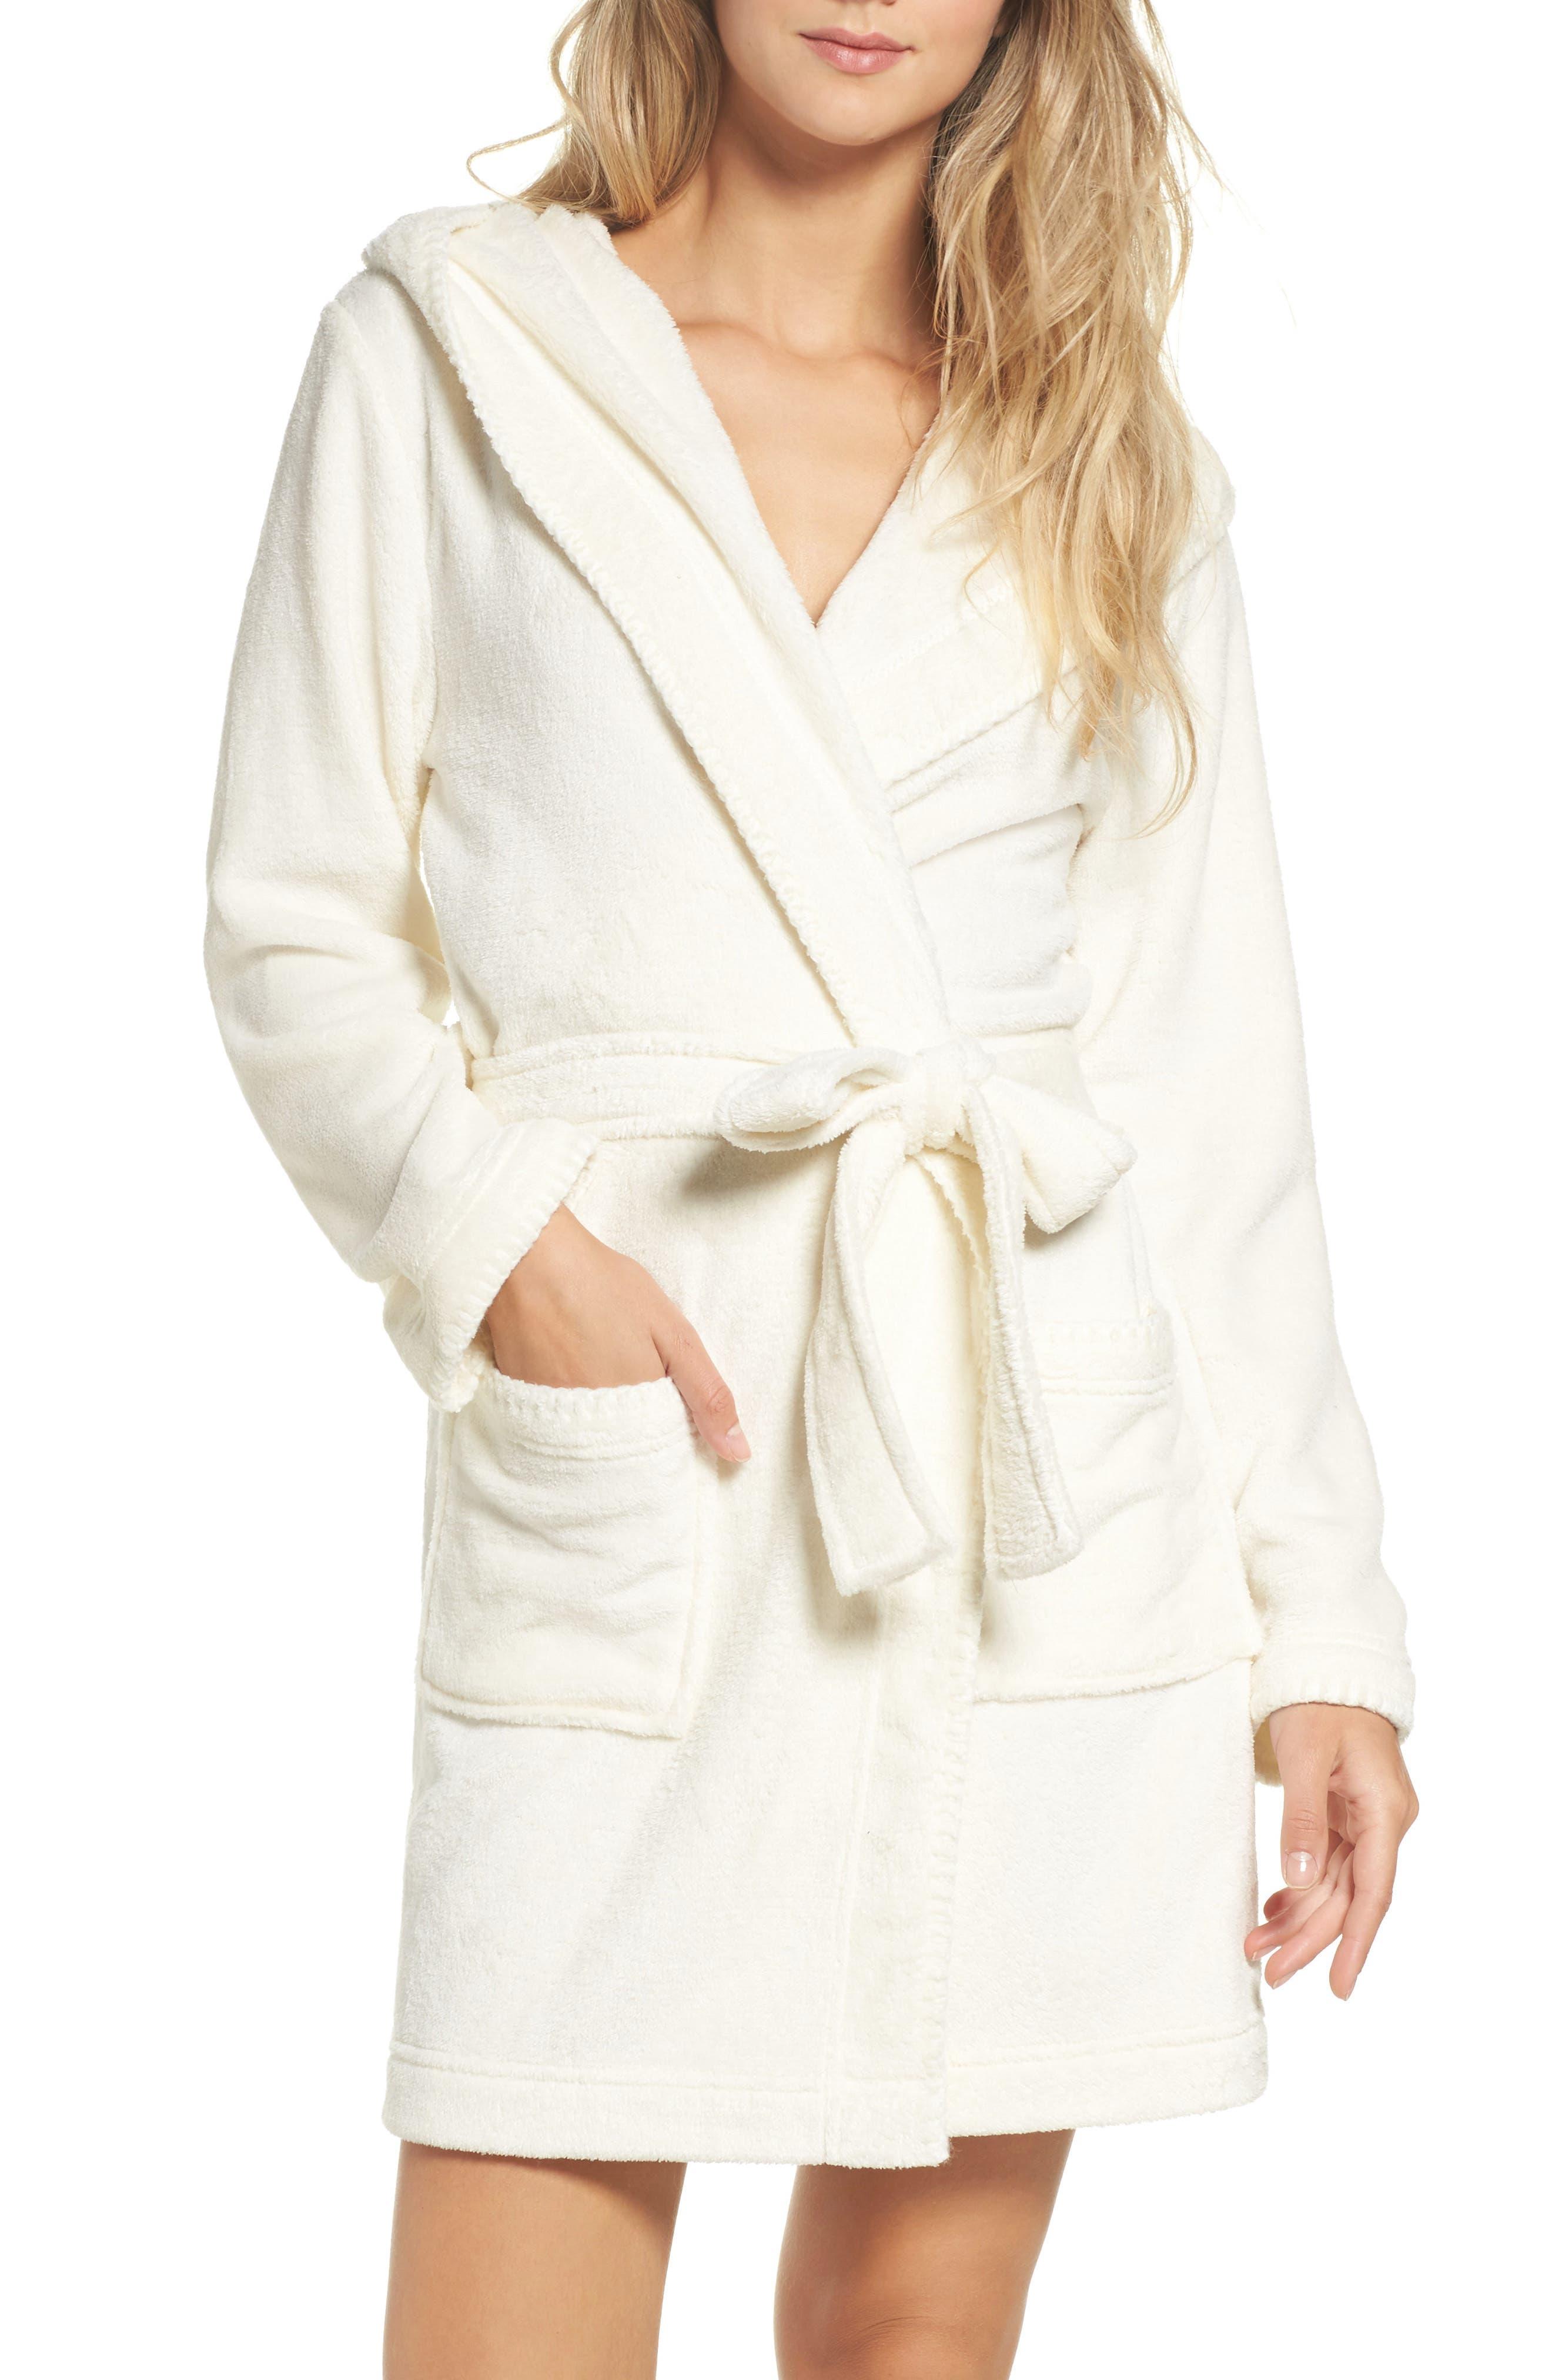 Main Image - Make + Model Starry Night Plush Short Robe